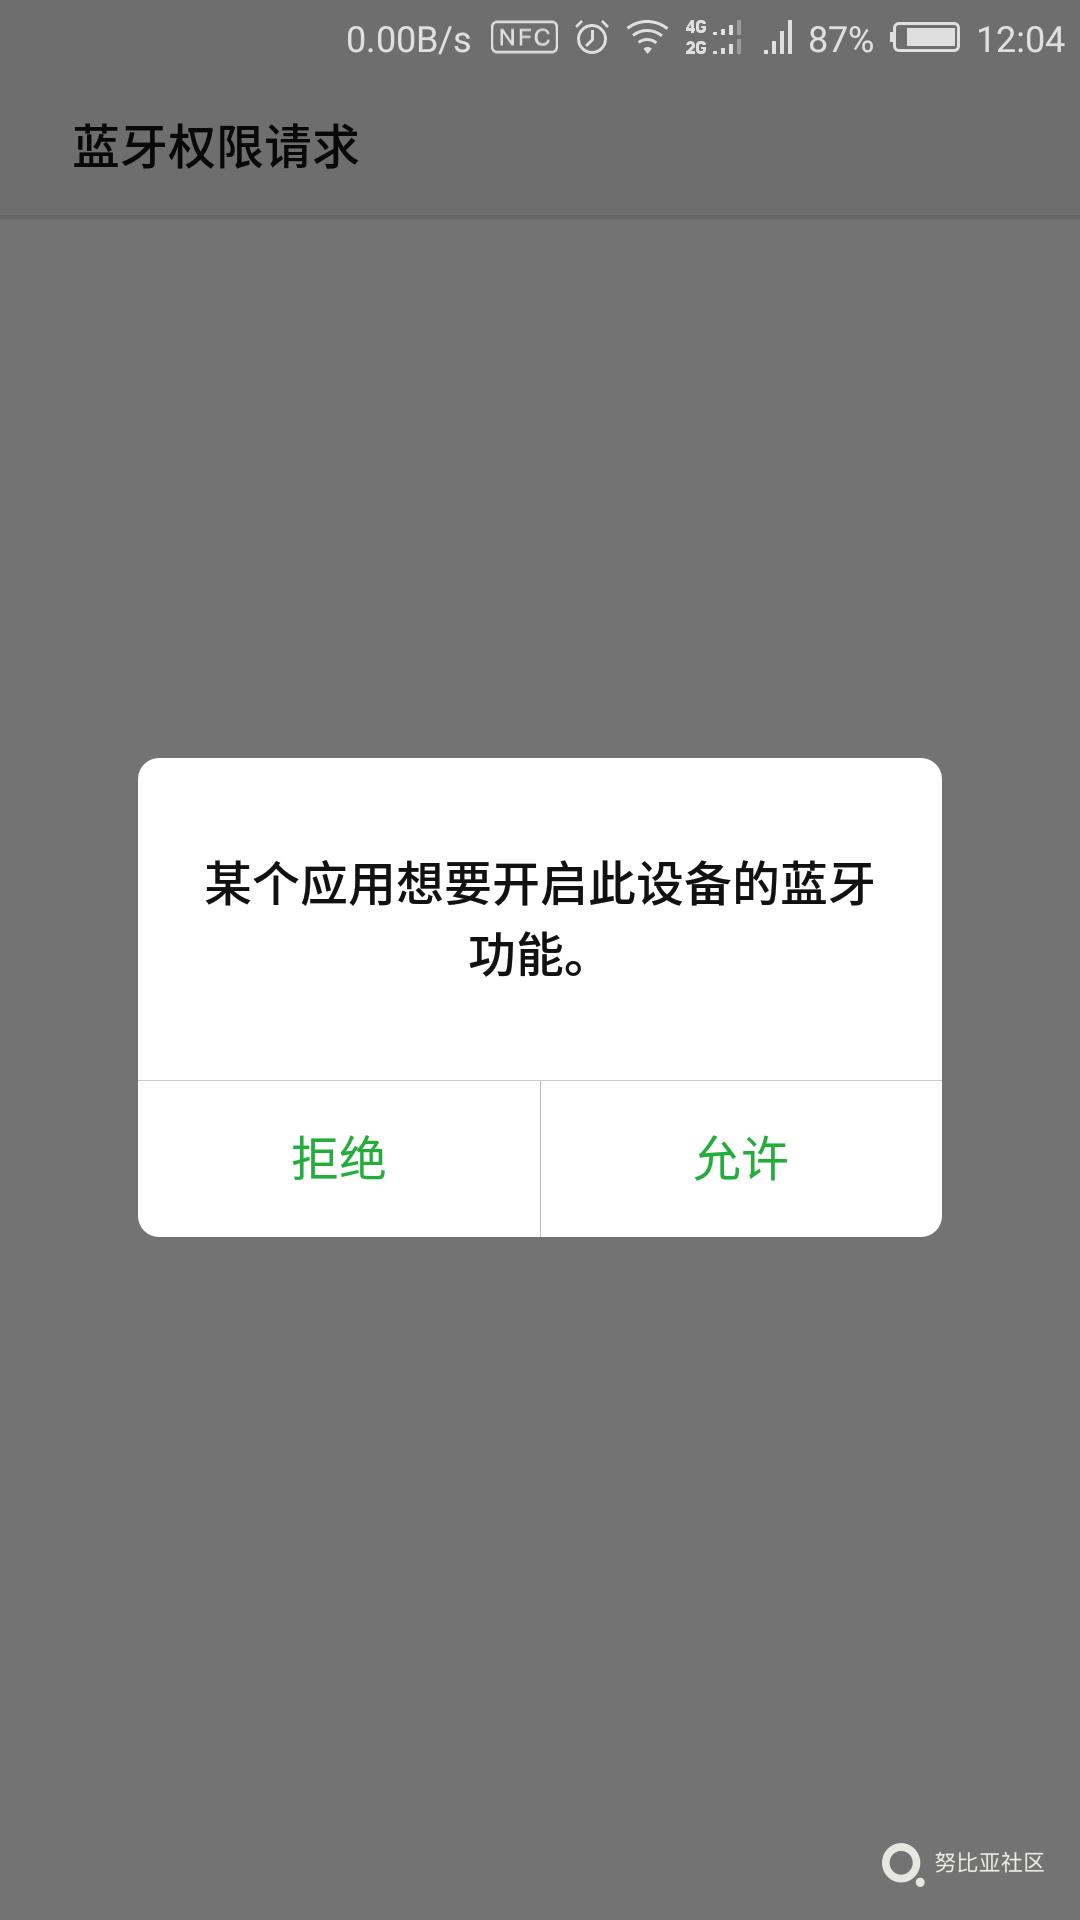 Screenshot_2018-01-07-12-04-24.png